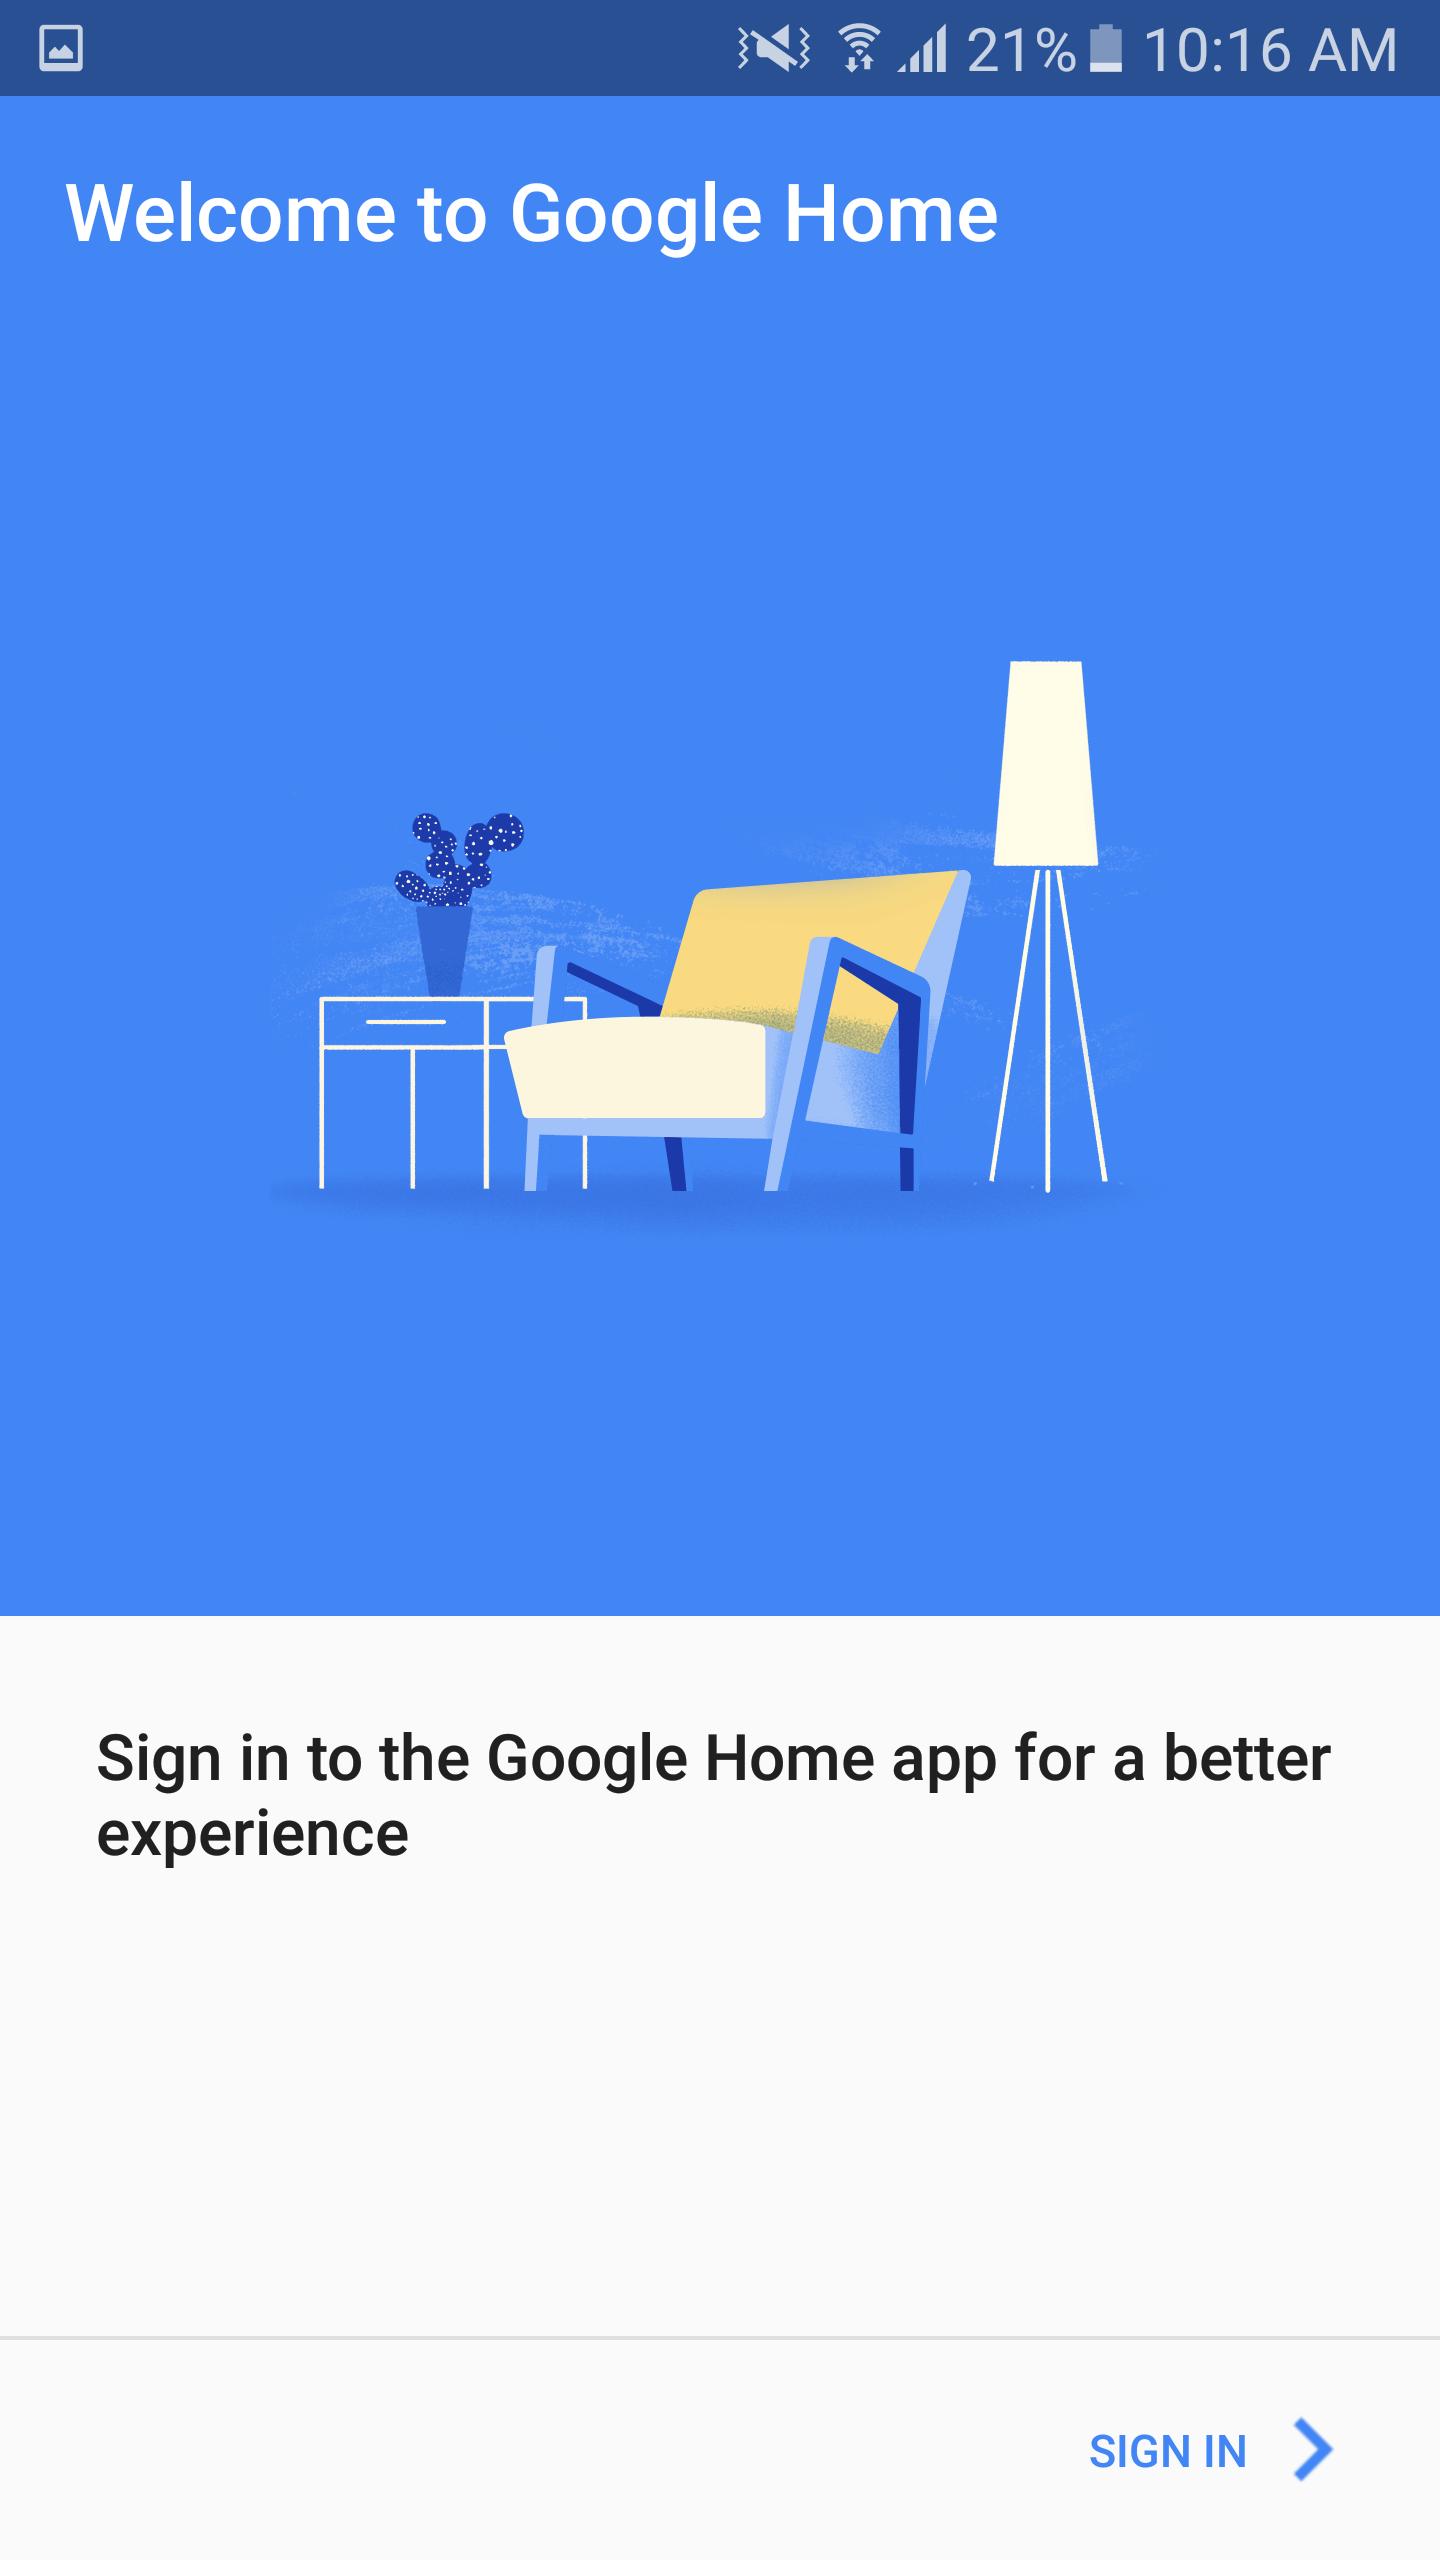 Google Home Onboarding